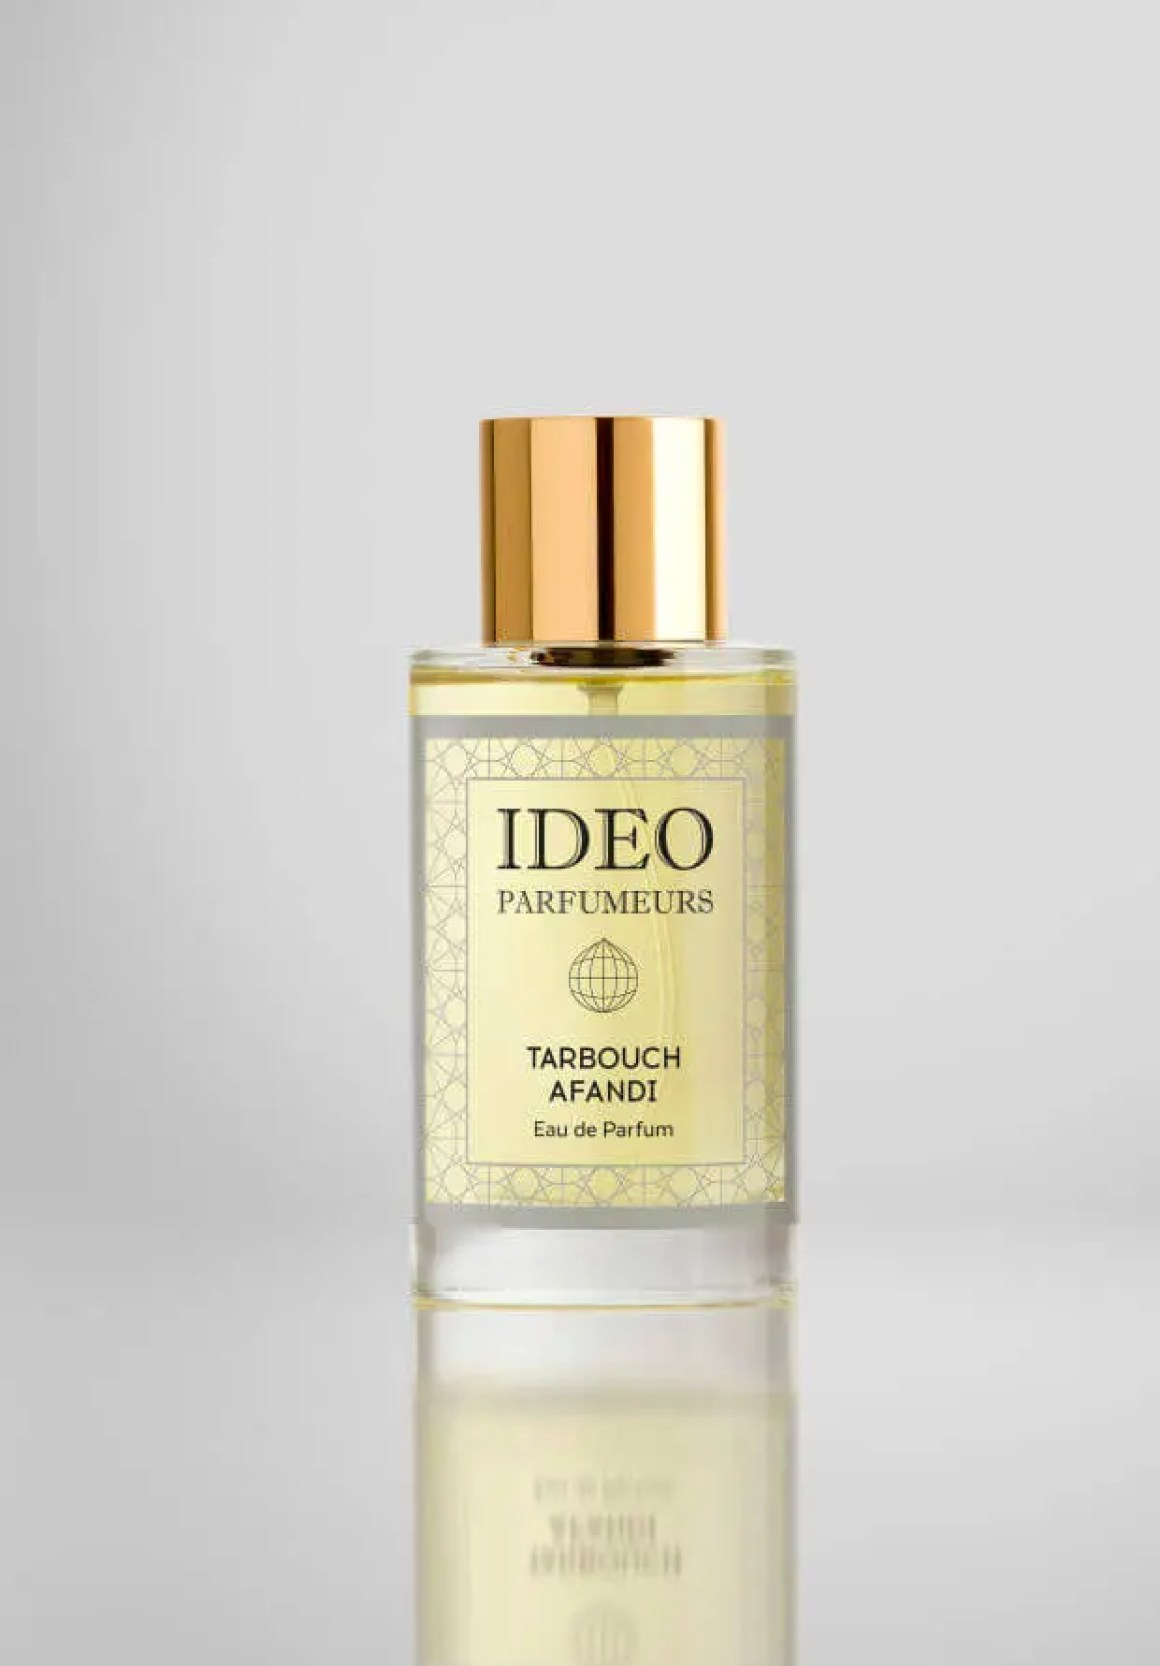 Ideo Parfums | B EDP Tarbouch Afandi.jpg